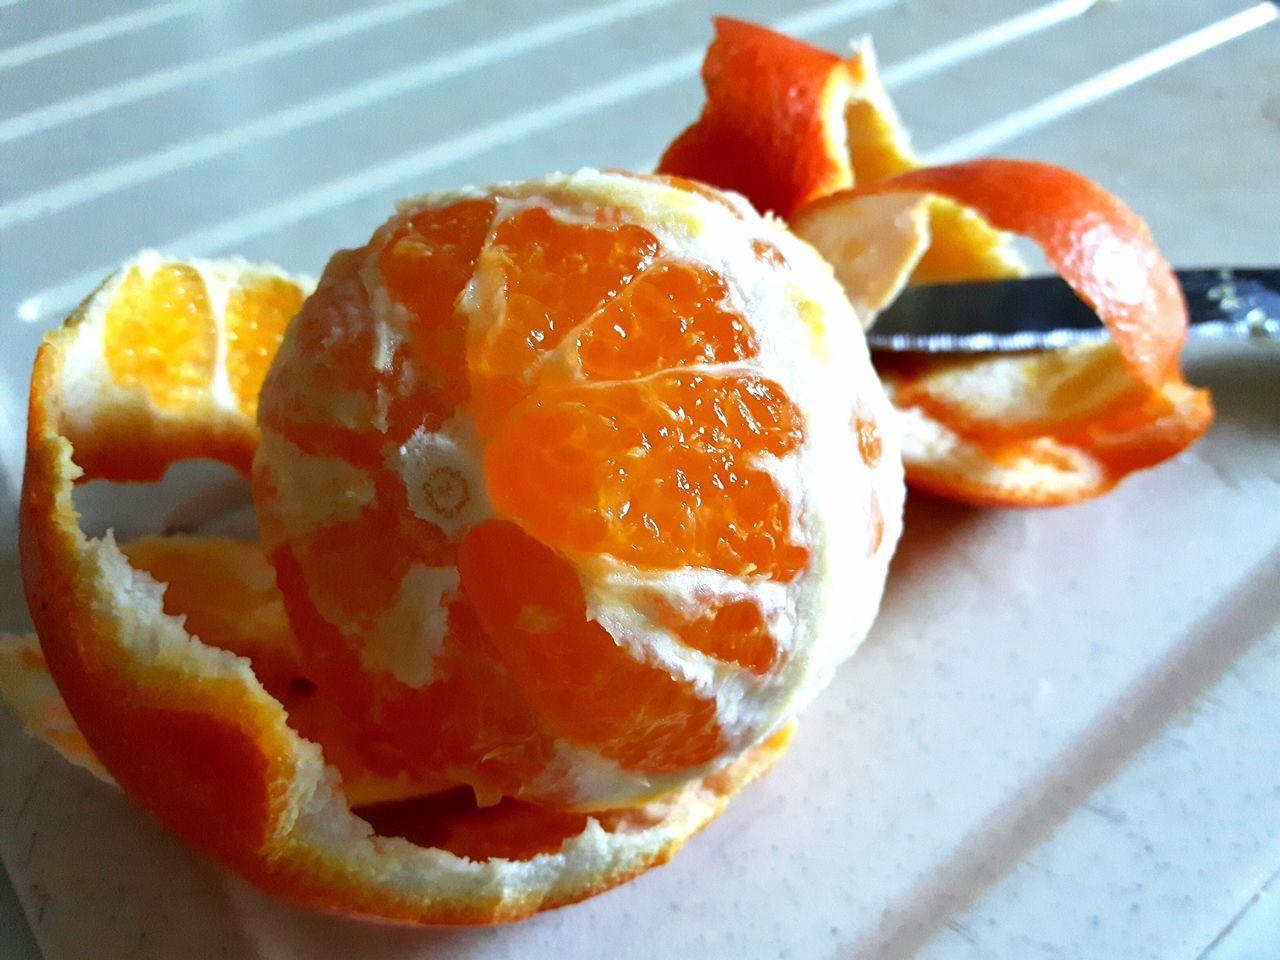 Goodmorning EyeEm  Breakfast Pornfood EyeEm Best Shots Naturelovers Lovephotography  Eyem Nature Lovers  Fruitporn Friuts